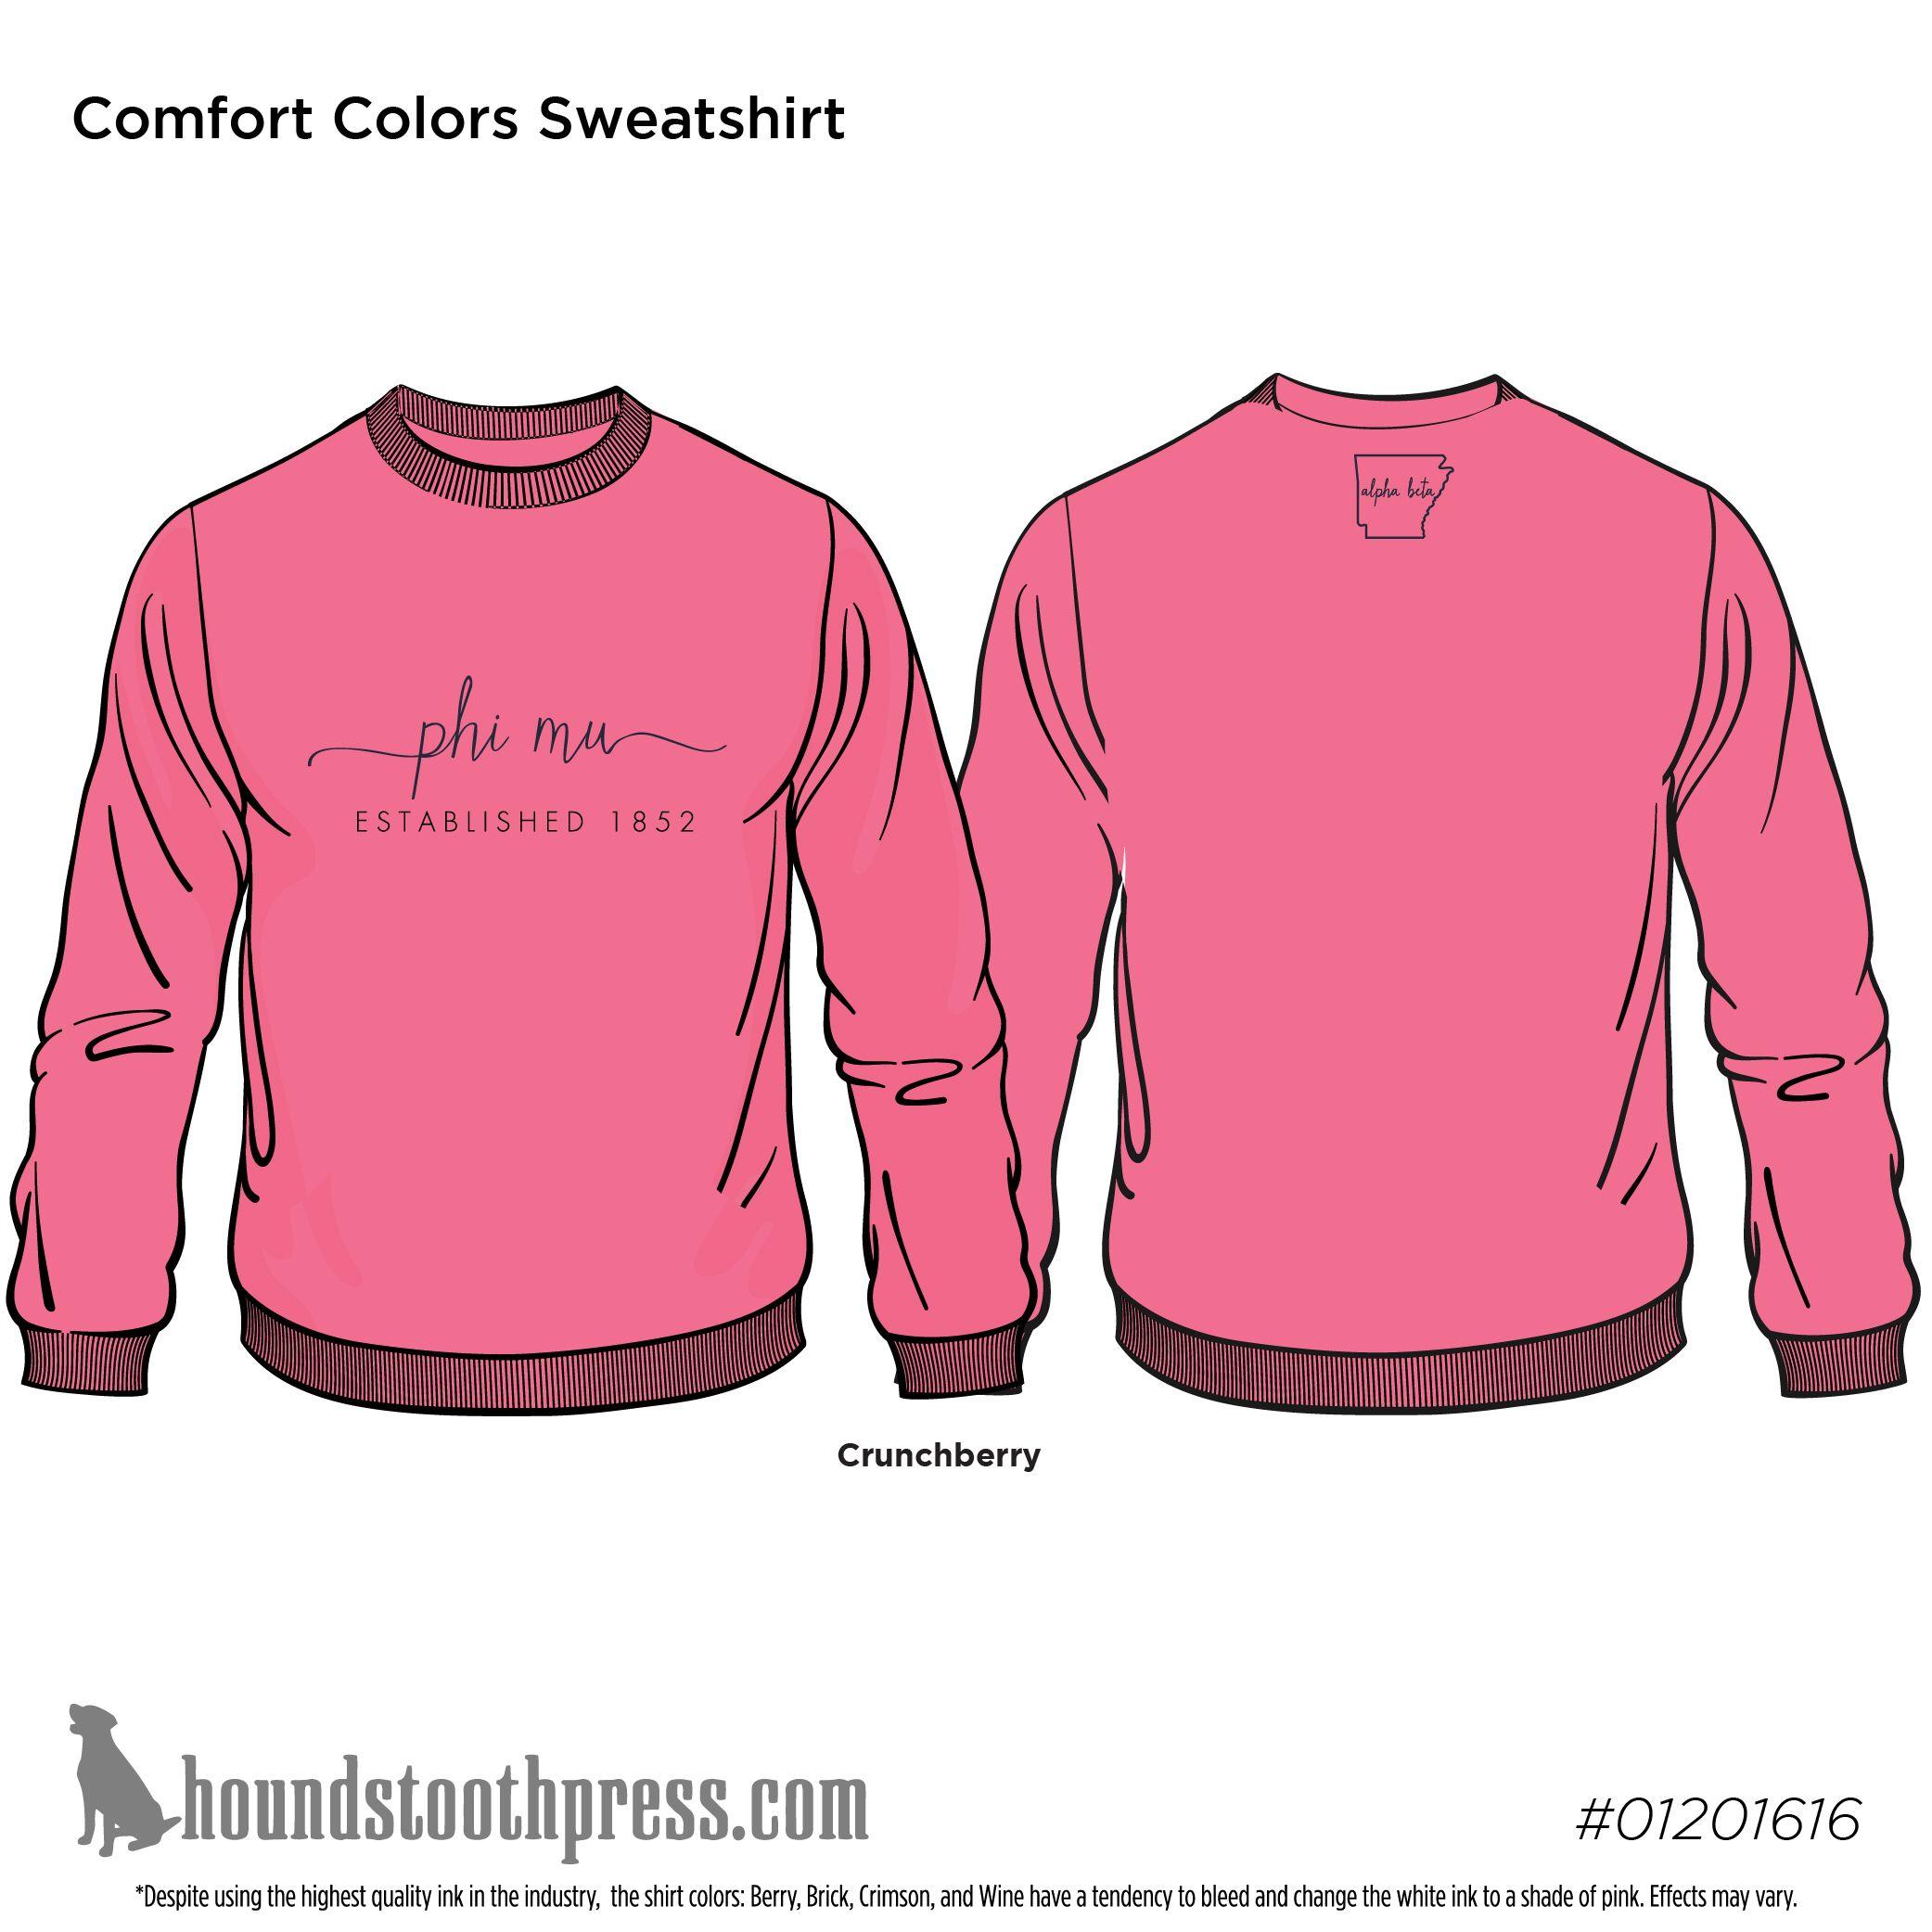 University Of Arkansas Phi Mu Comfort Colors Sweatshirt With